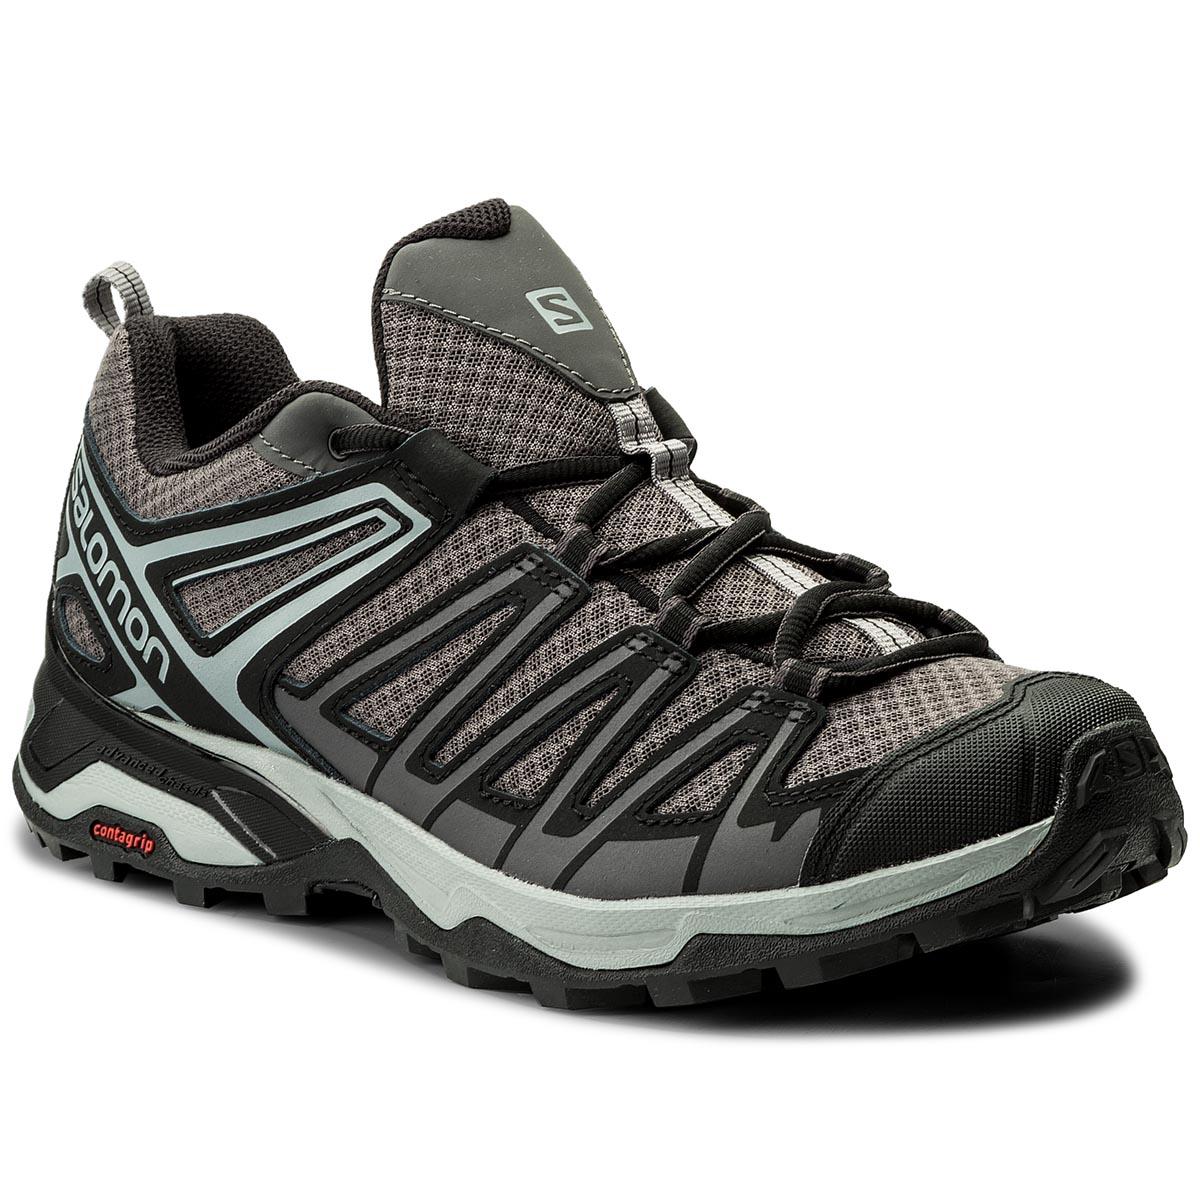 b3b74ecbb43 Trekingová obuv SALOMON - X Ultra 3 Prime 401250 30 W0 Magnet Black ...